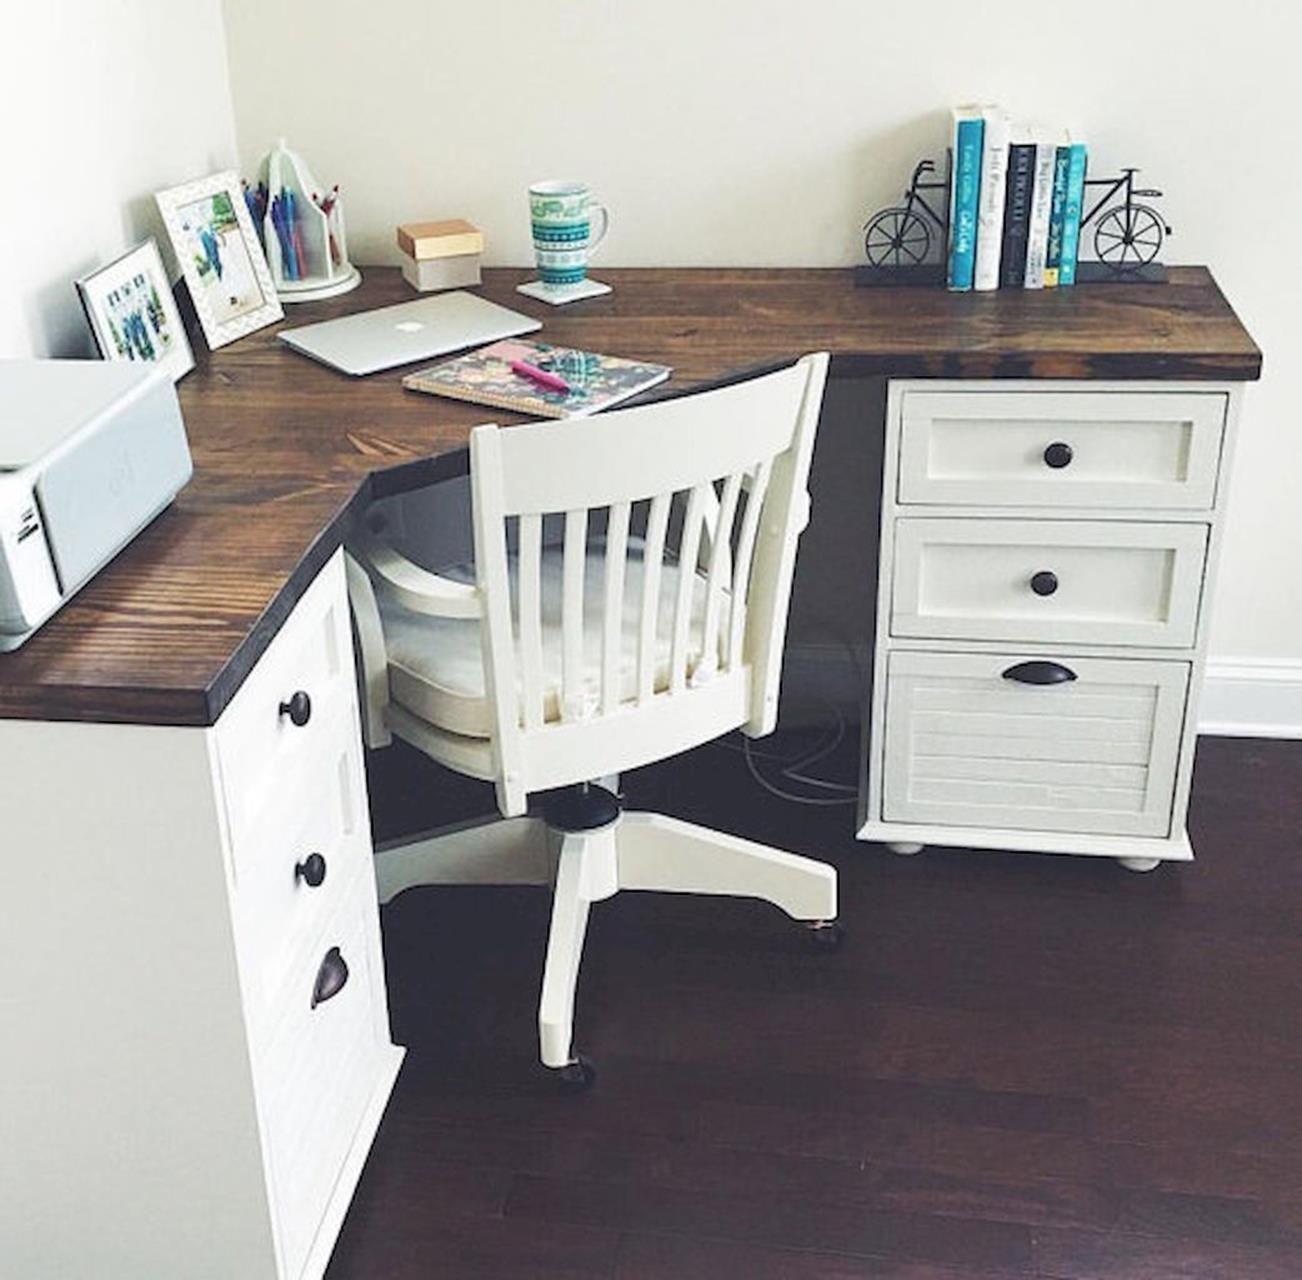 farmhouse office desk decor 4 home sweet home in 2019 farmhouse rh pinterest com